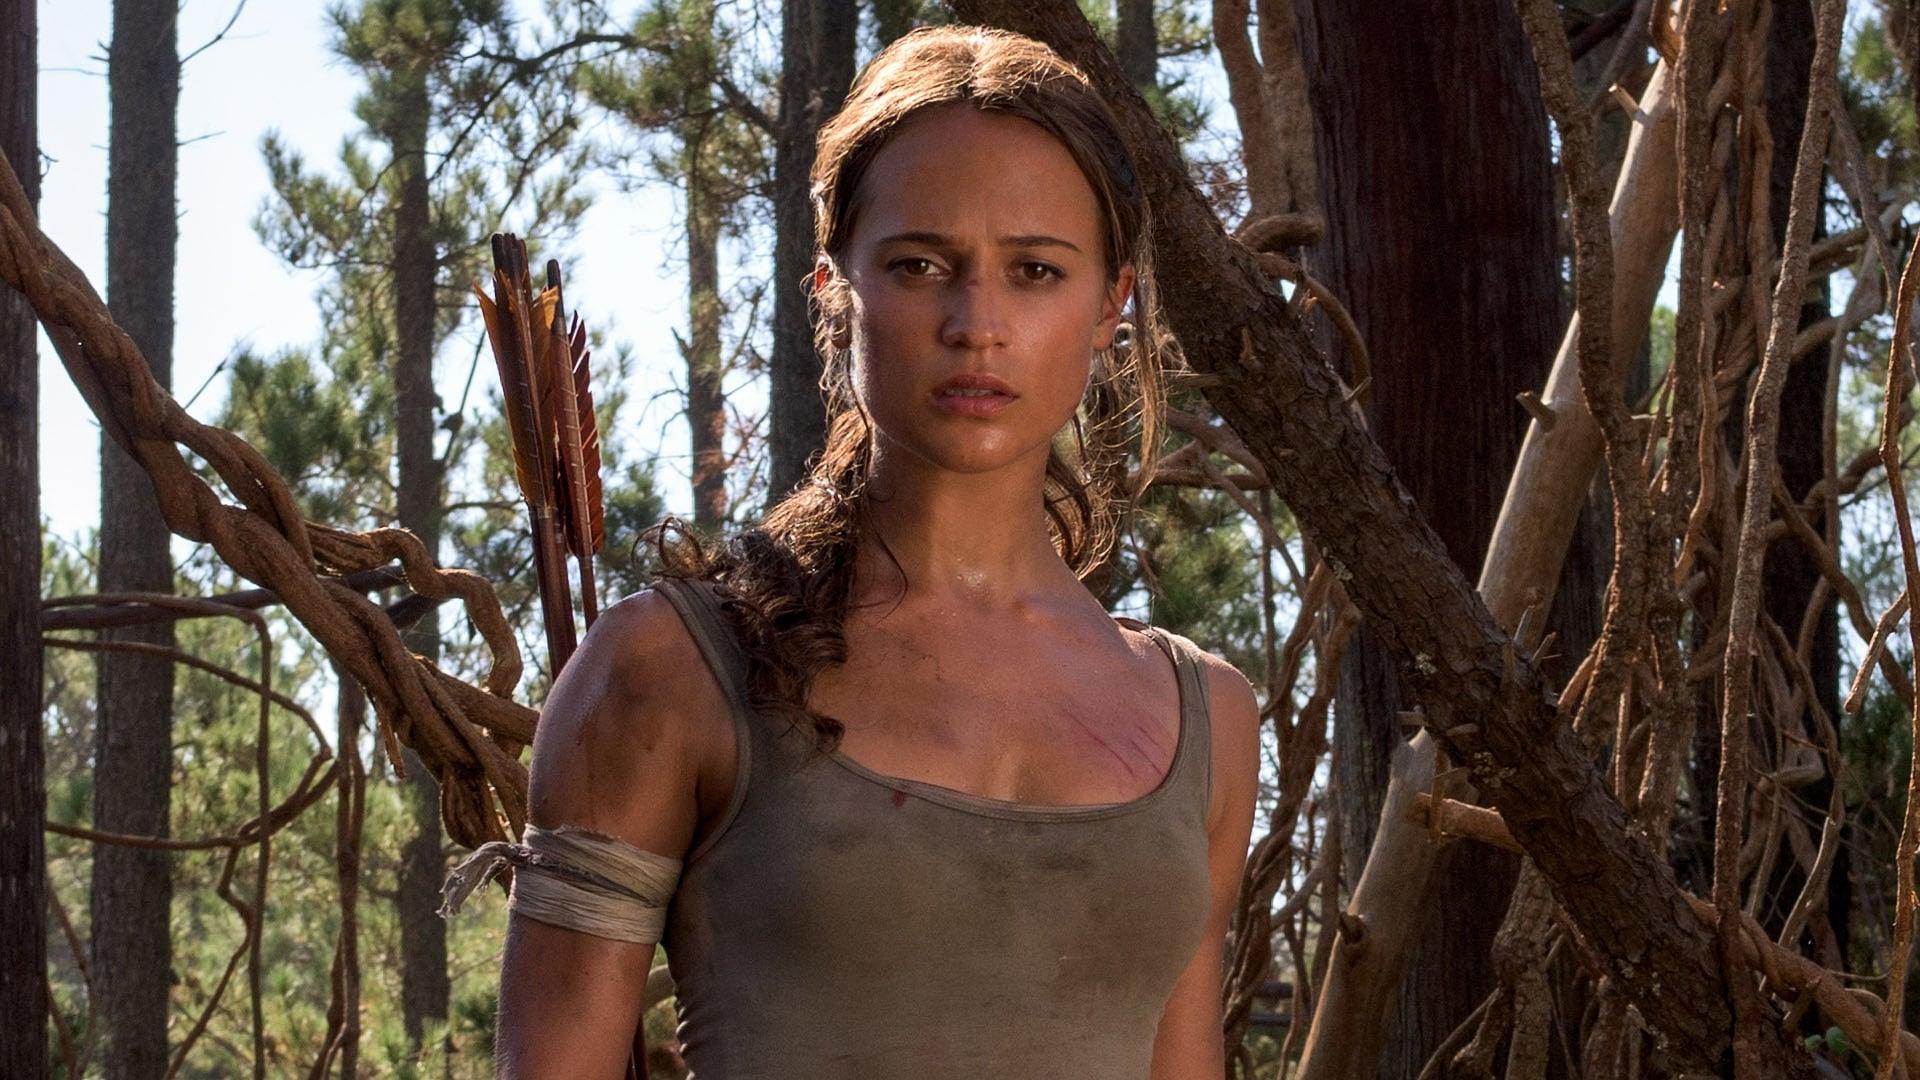 Tomb Raider (2018) - The Movie